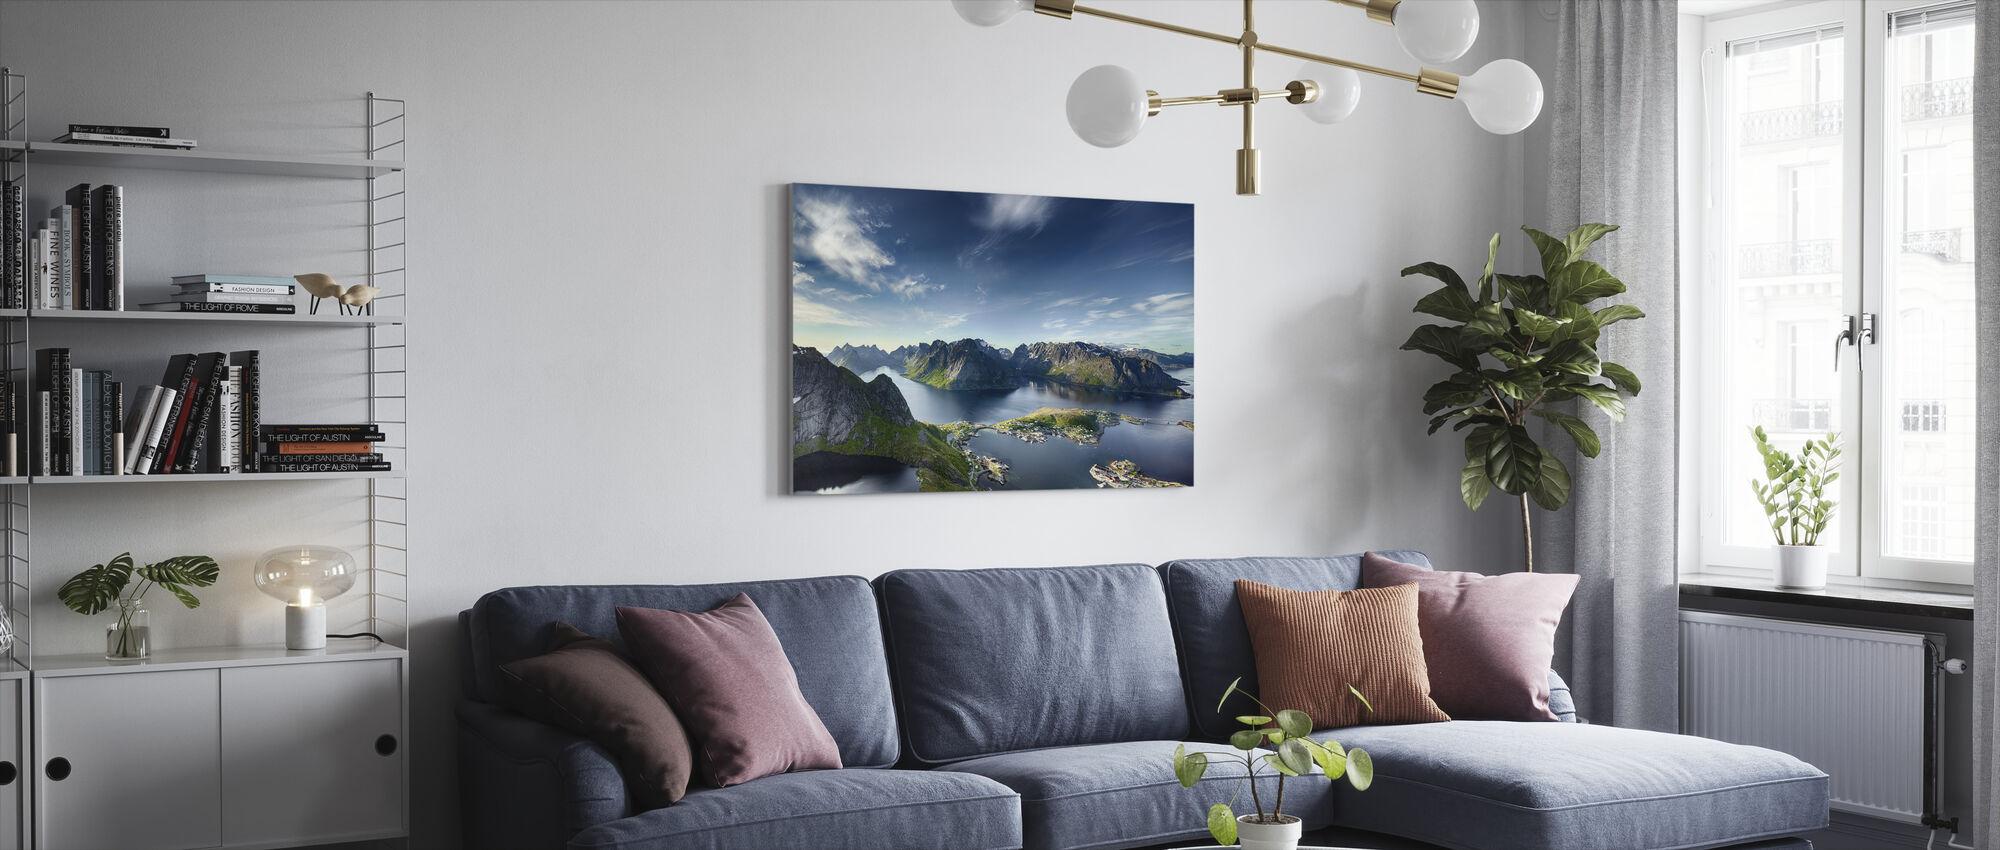 Panoramautsikt över Reine i Lofoten, Norge - Canvastavla - Vardagsrum